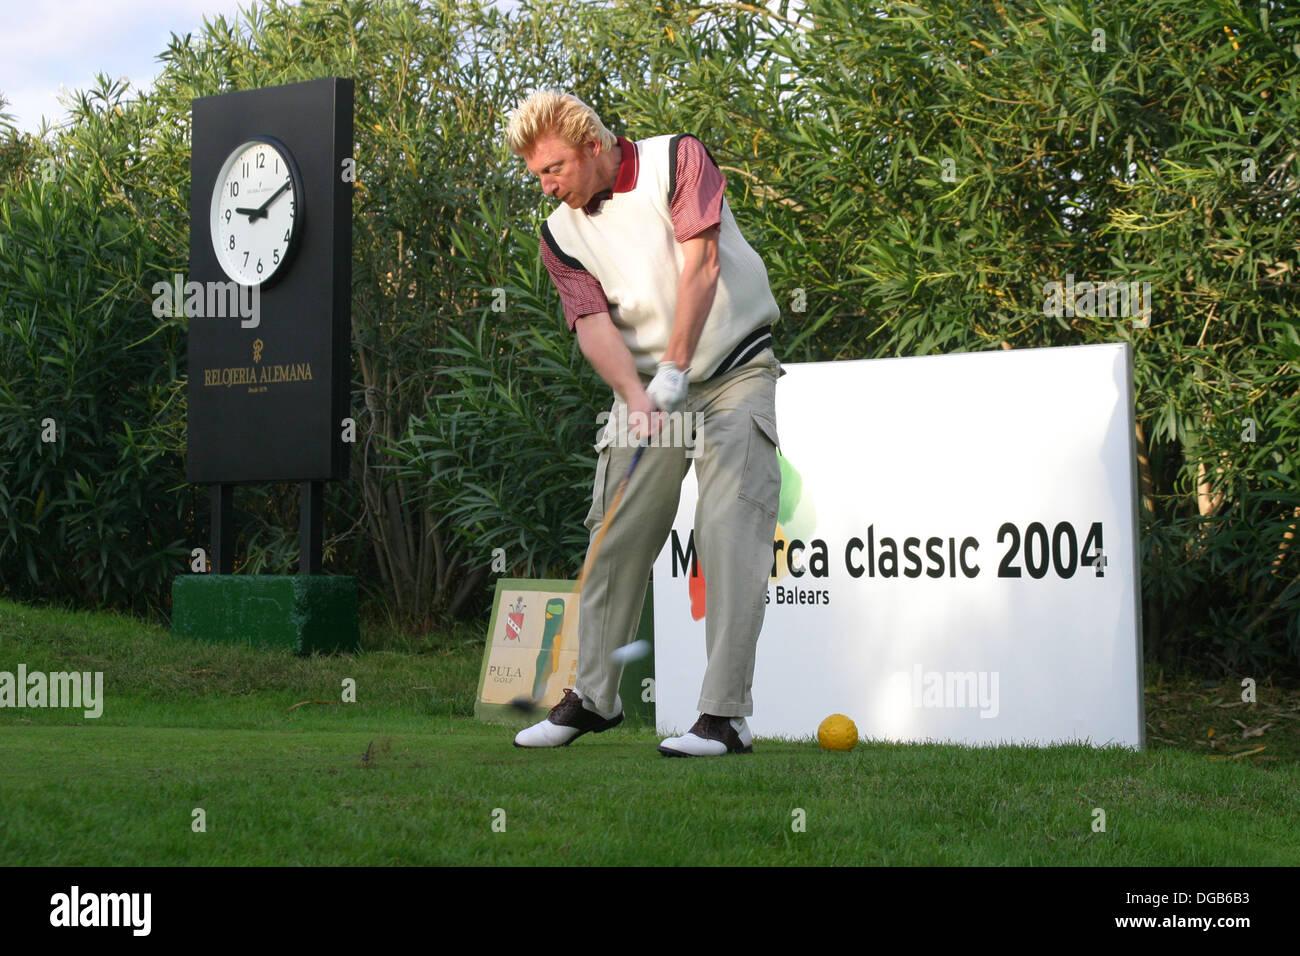 Boris Becker playing golf in Majorca´s Pula golf, Spain - Stock Image